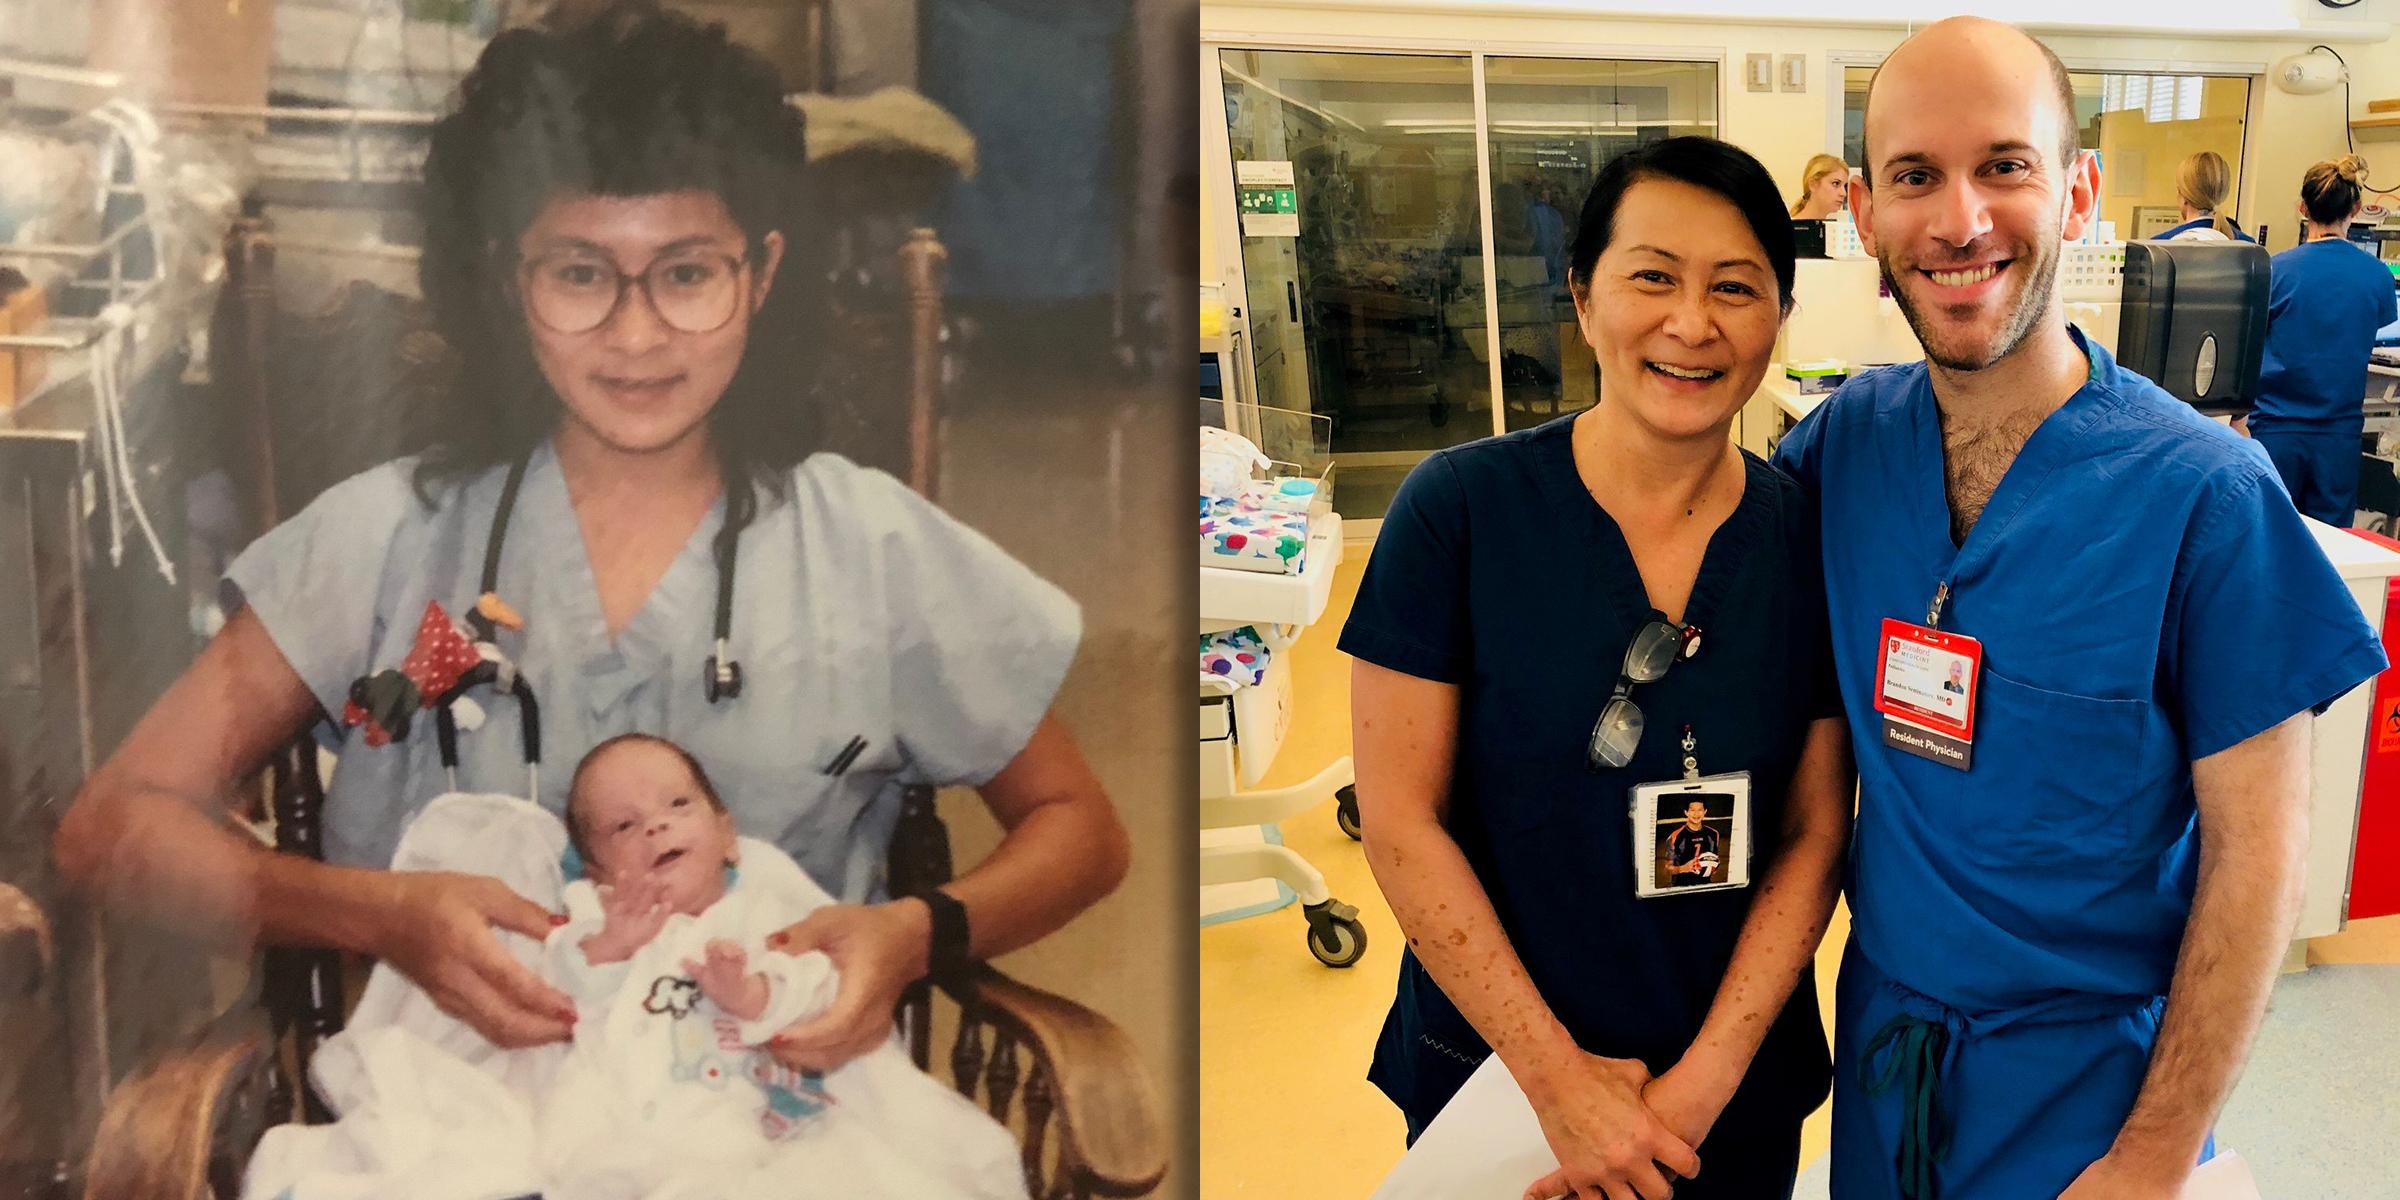 Found a nurse after 42 years